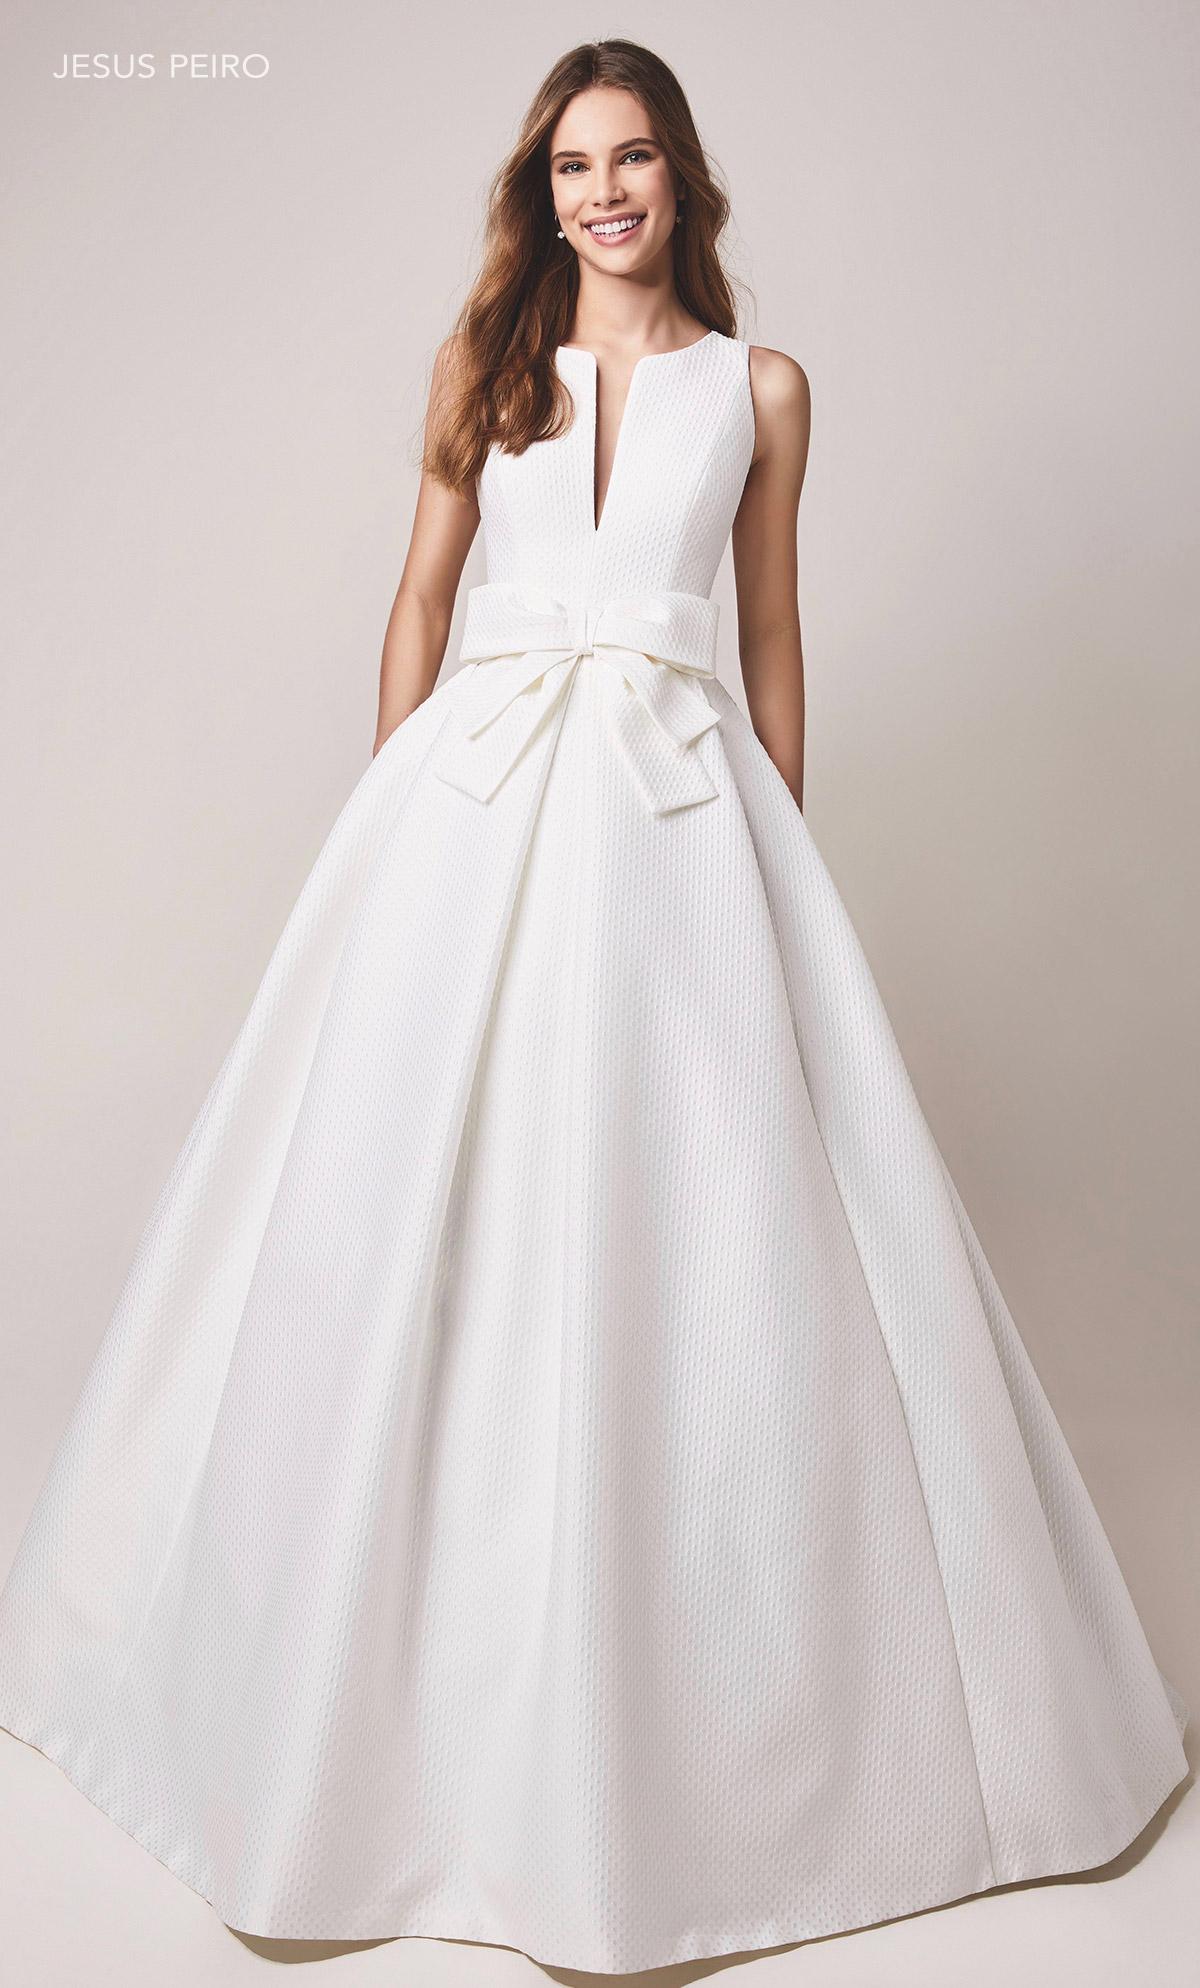 Vestido novia Jesús Peiró Ref.110